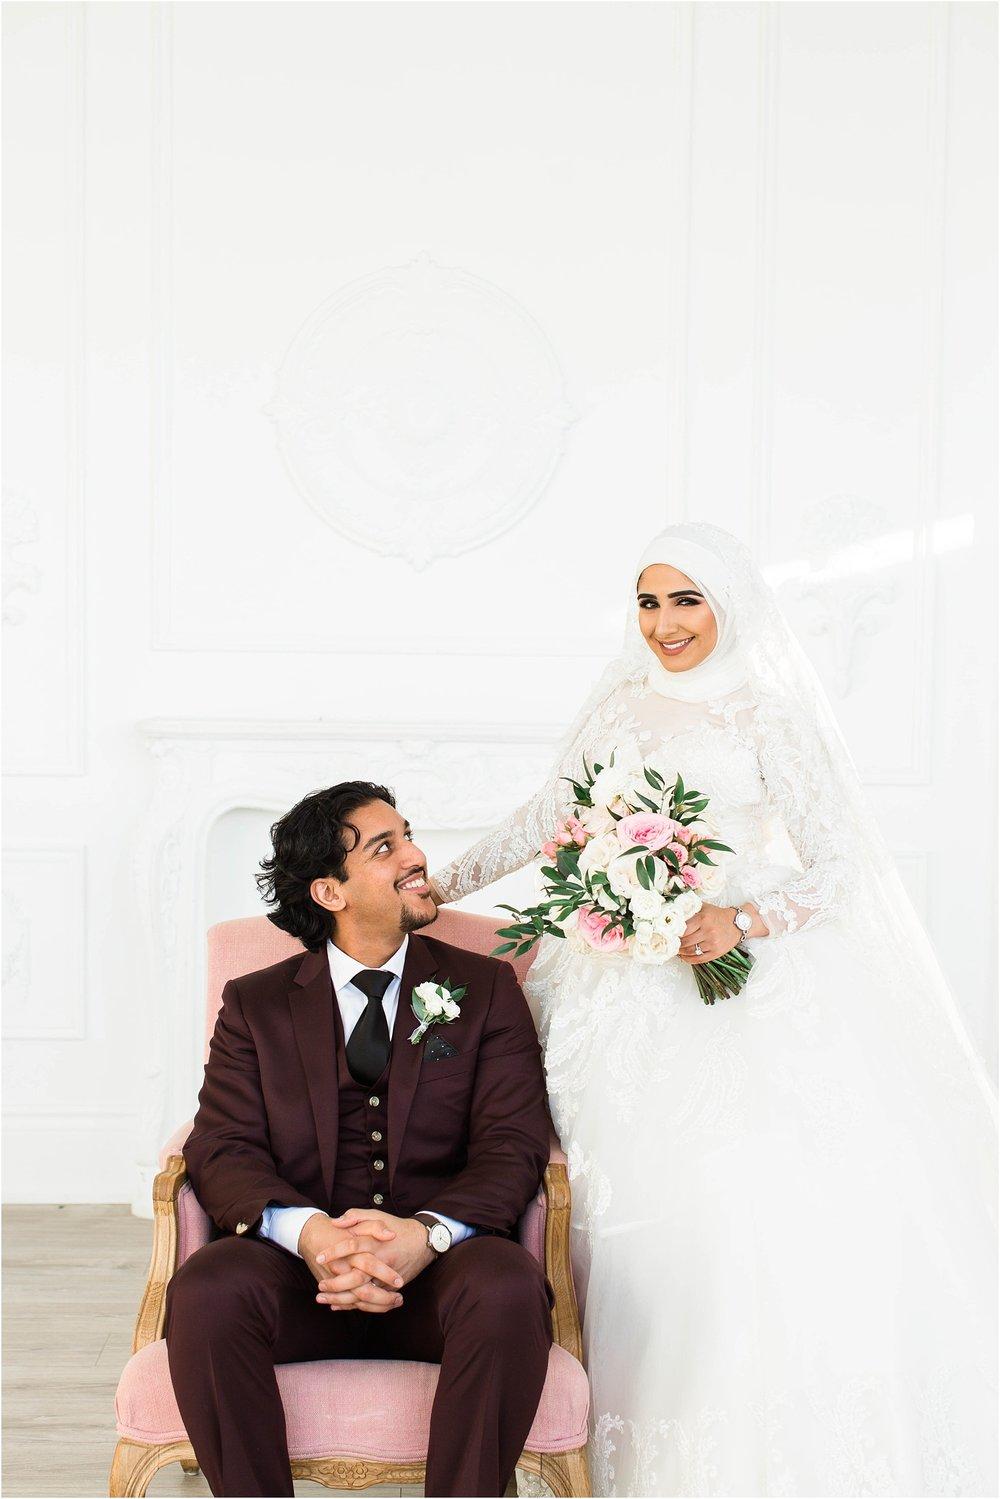 Red-Rose-Convention-Mint-Room-Wedding-Toronto-Mississauga-Brampton-Scarborough-GTA-Pakistani-Indian-Wedding-Engagement-Photographer-Photography_0113.jpg